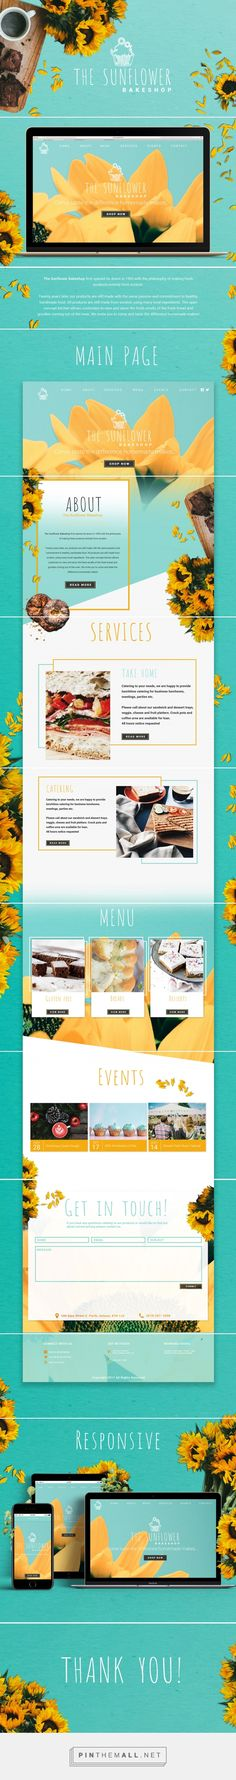 The Sunflower Bakeshop Web Design by Natasha Reddy